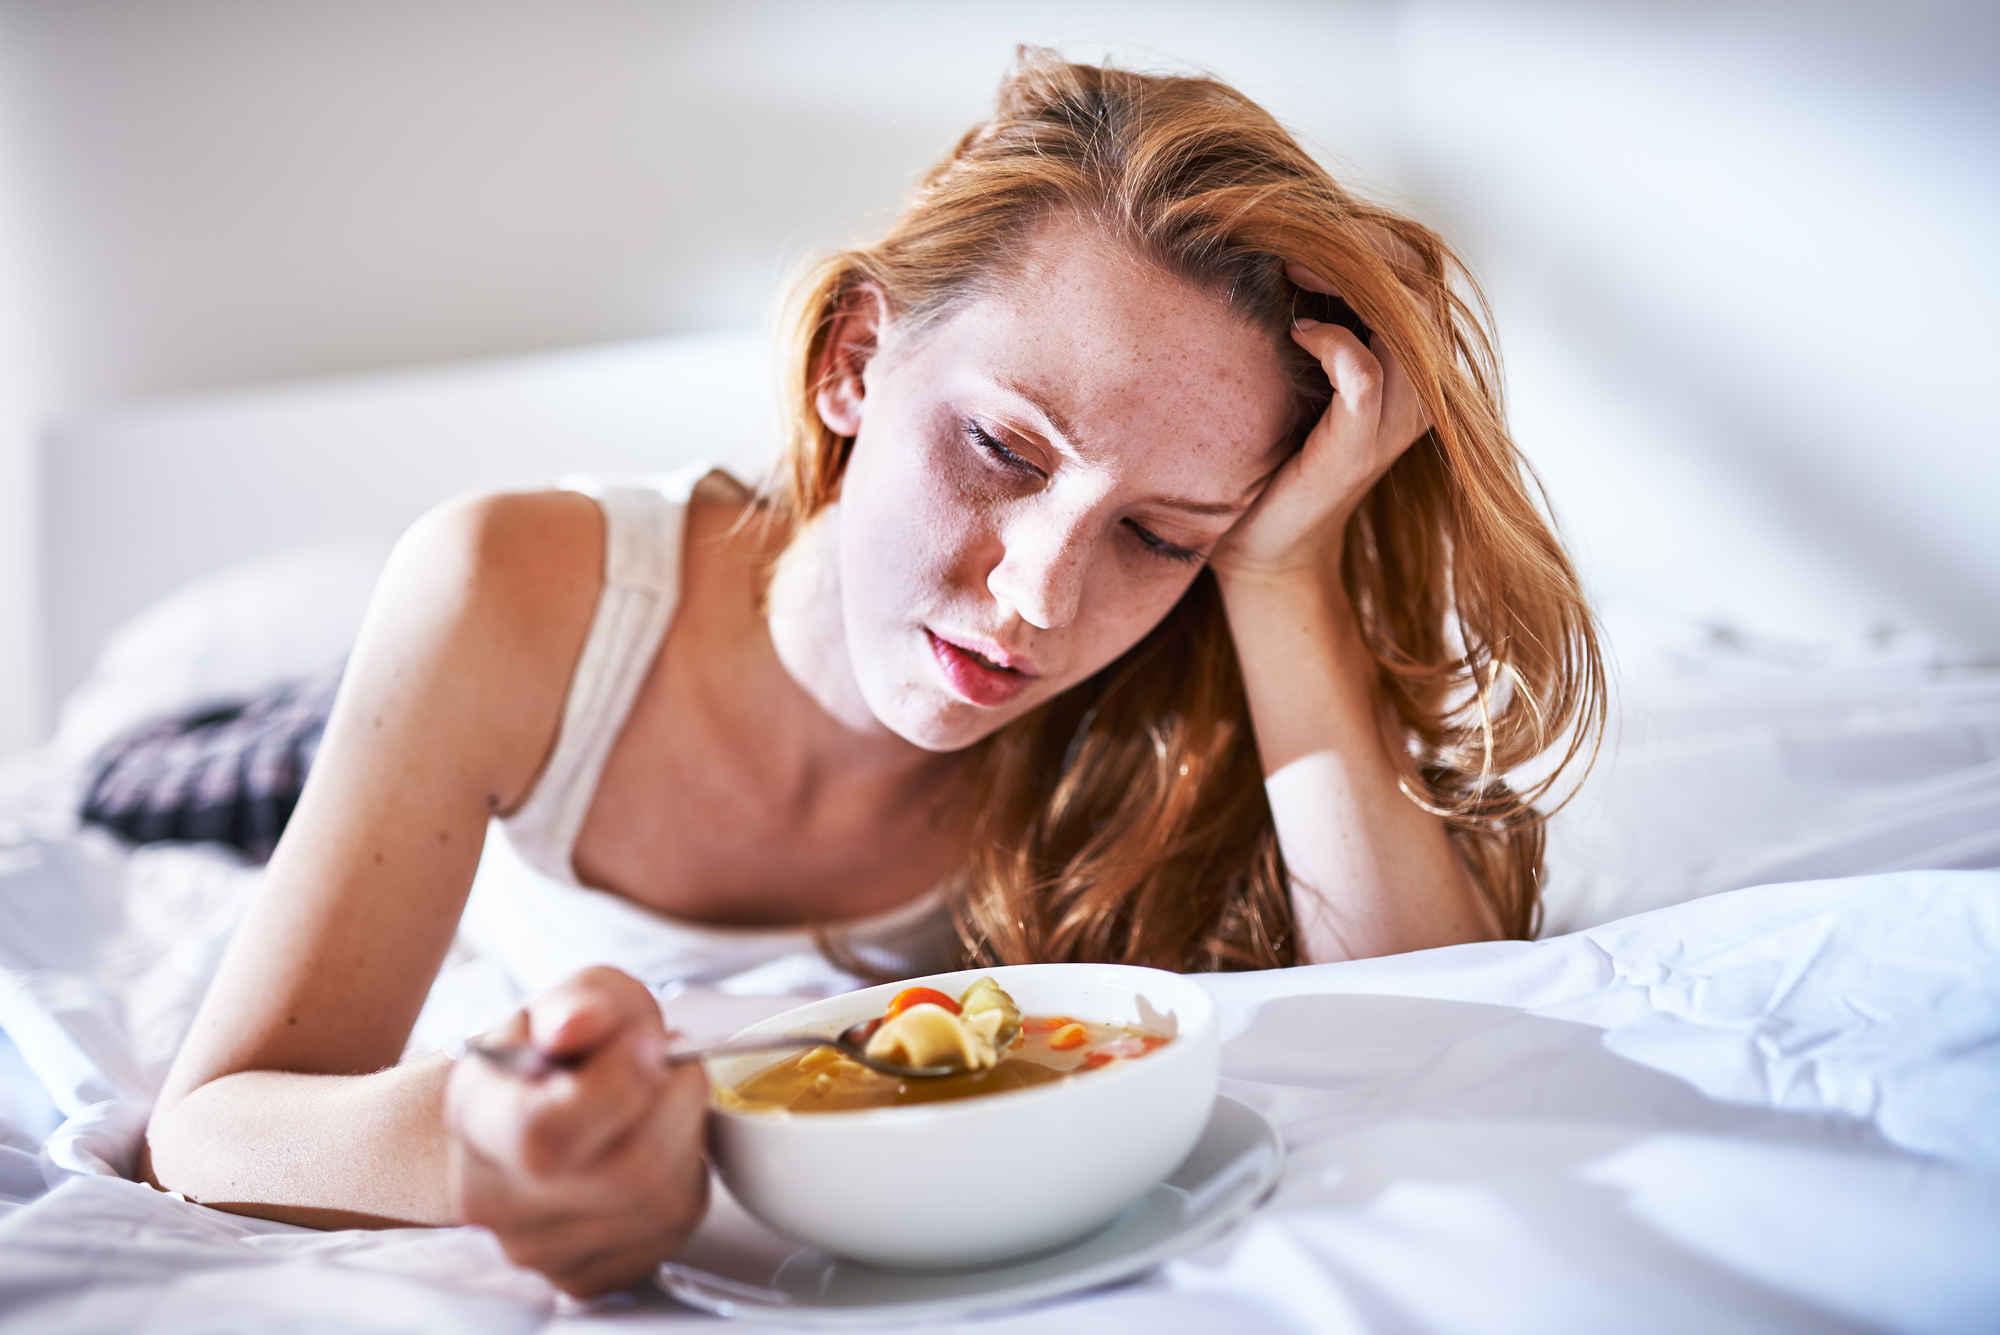 Feeling Nauseated While Eating Breakfast Feeling Nauseated While Eating Breakfast new photo